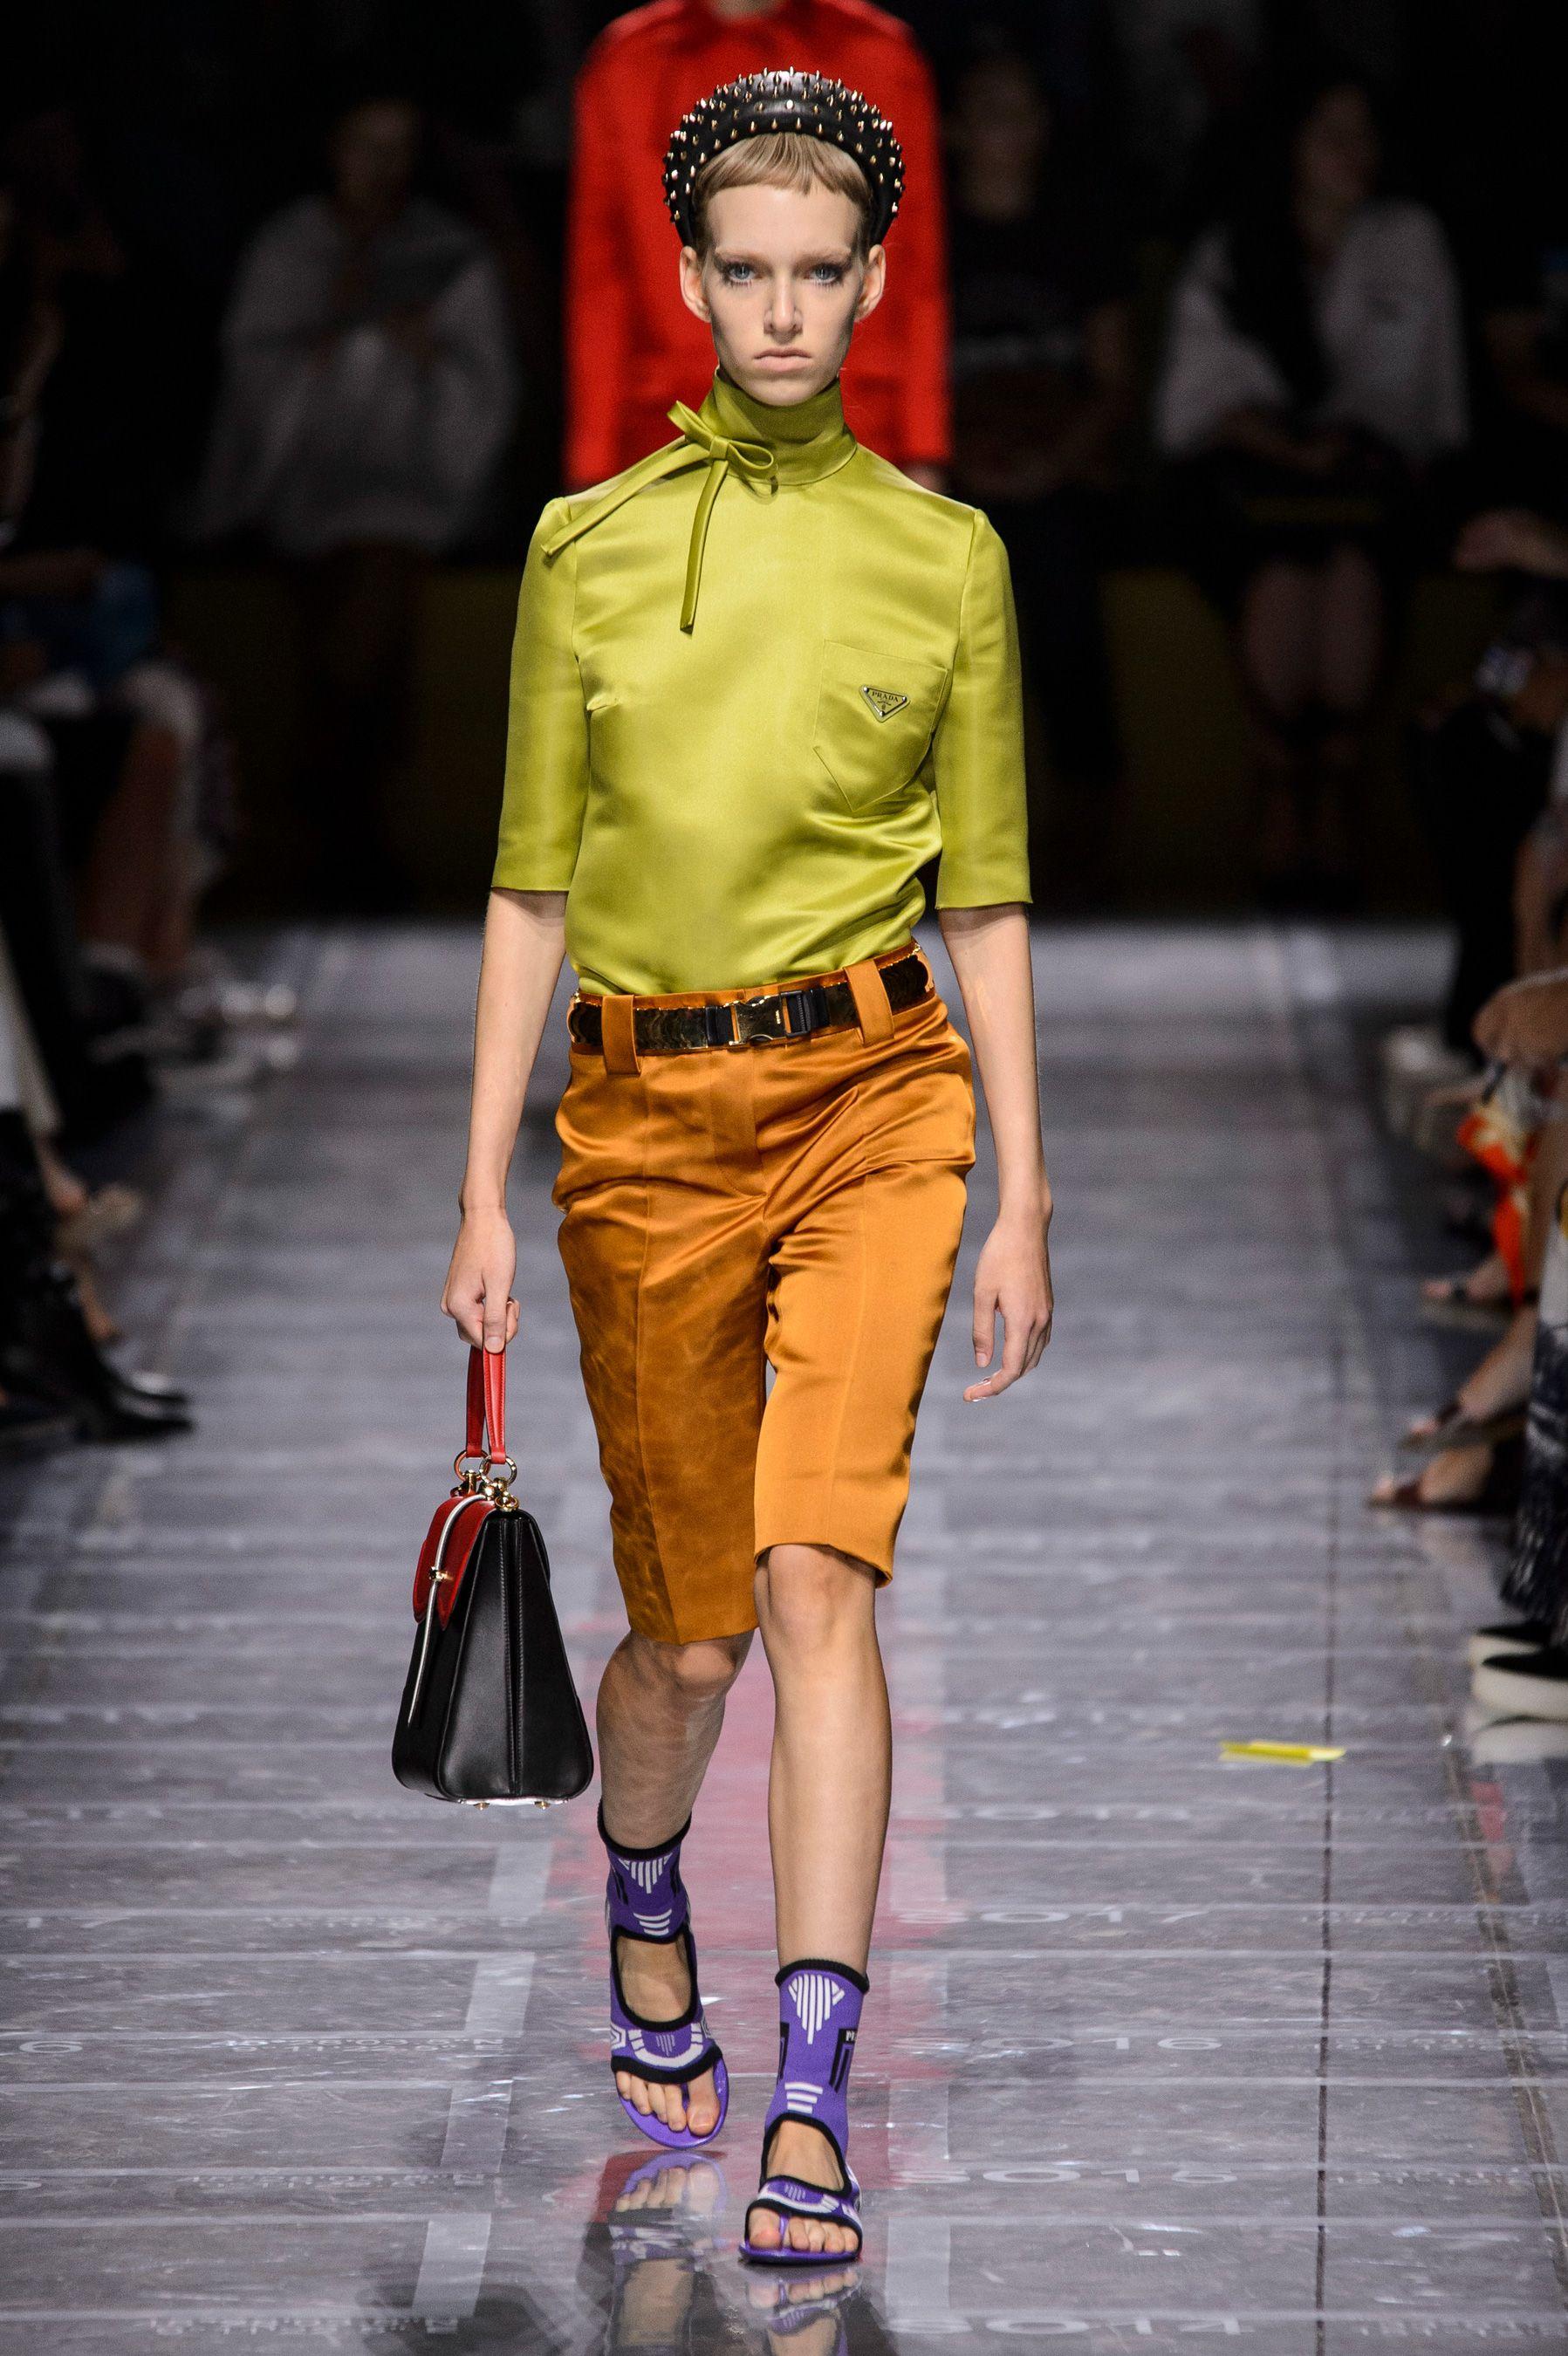 Prada, Prada SS 19, MFW, MFW SS 19, MFW 2019, primavera estate 2019, Milano fashion week, Milano, Fashion week, real time women SS 19, sfilate